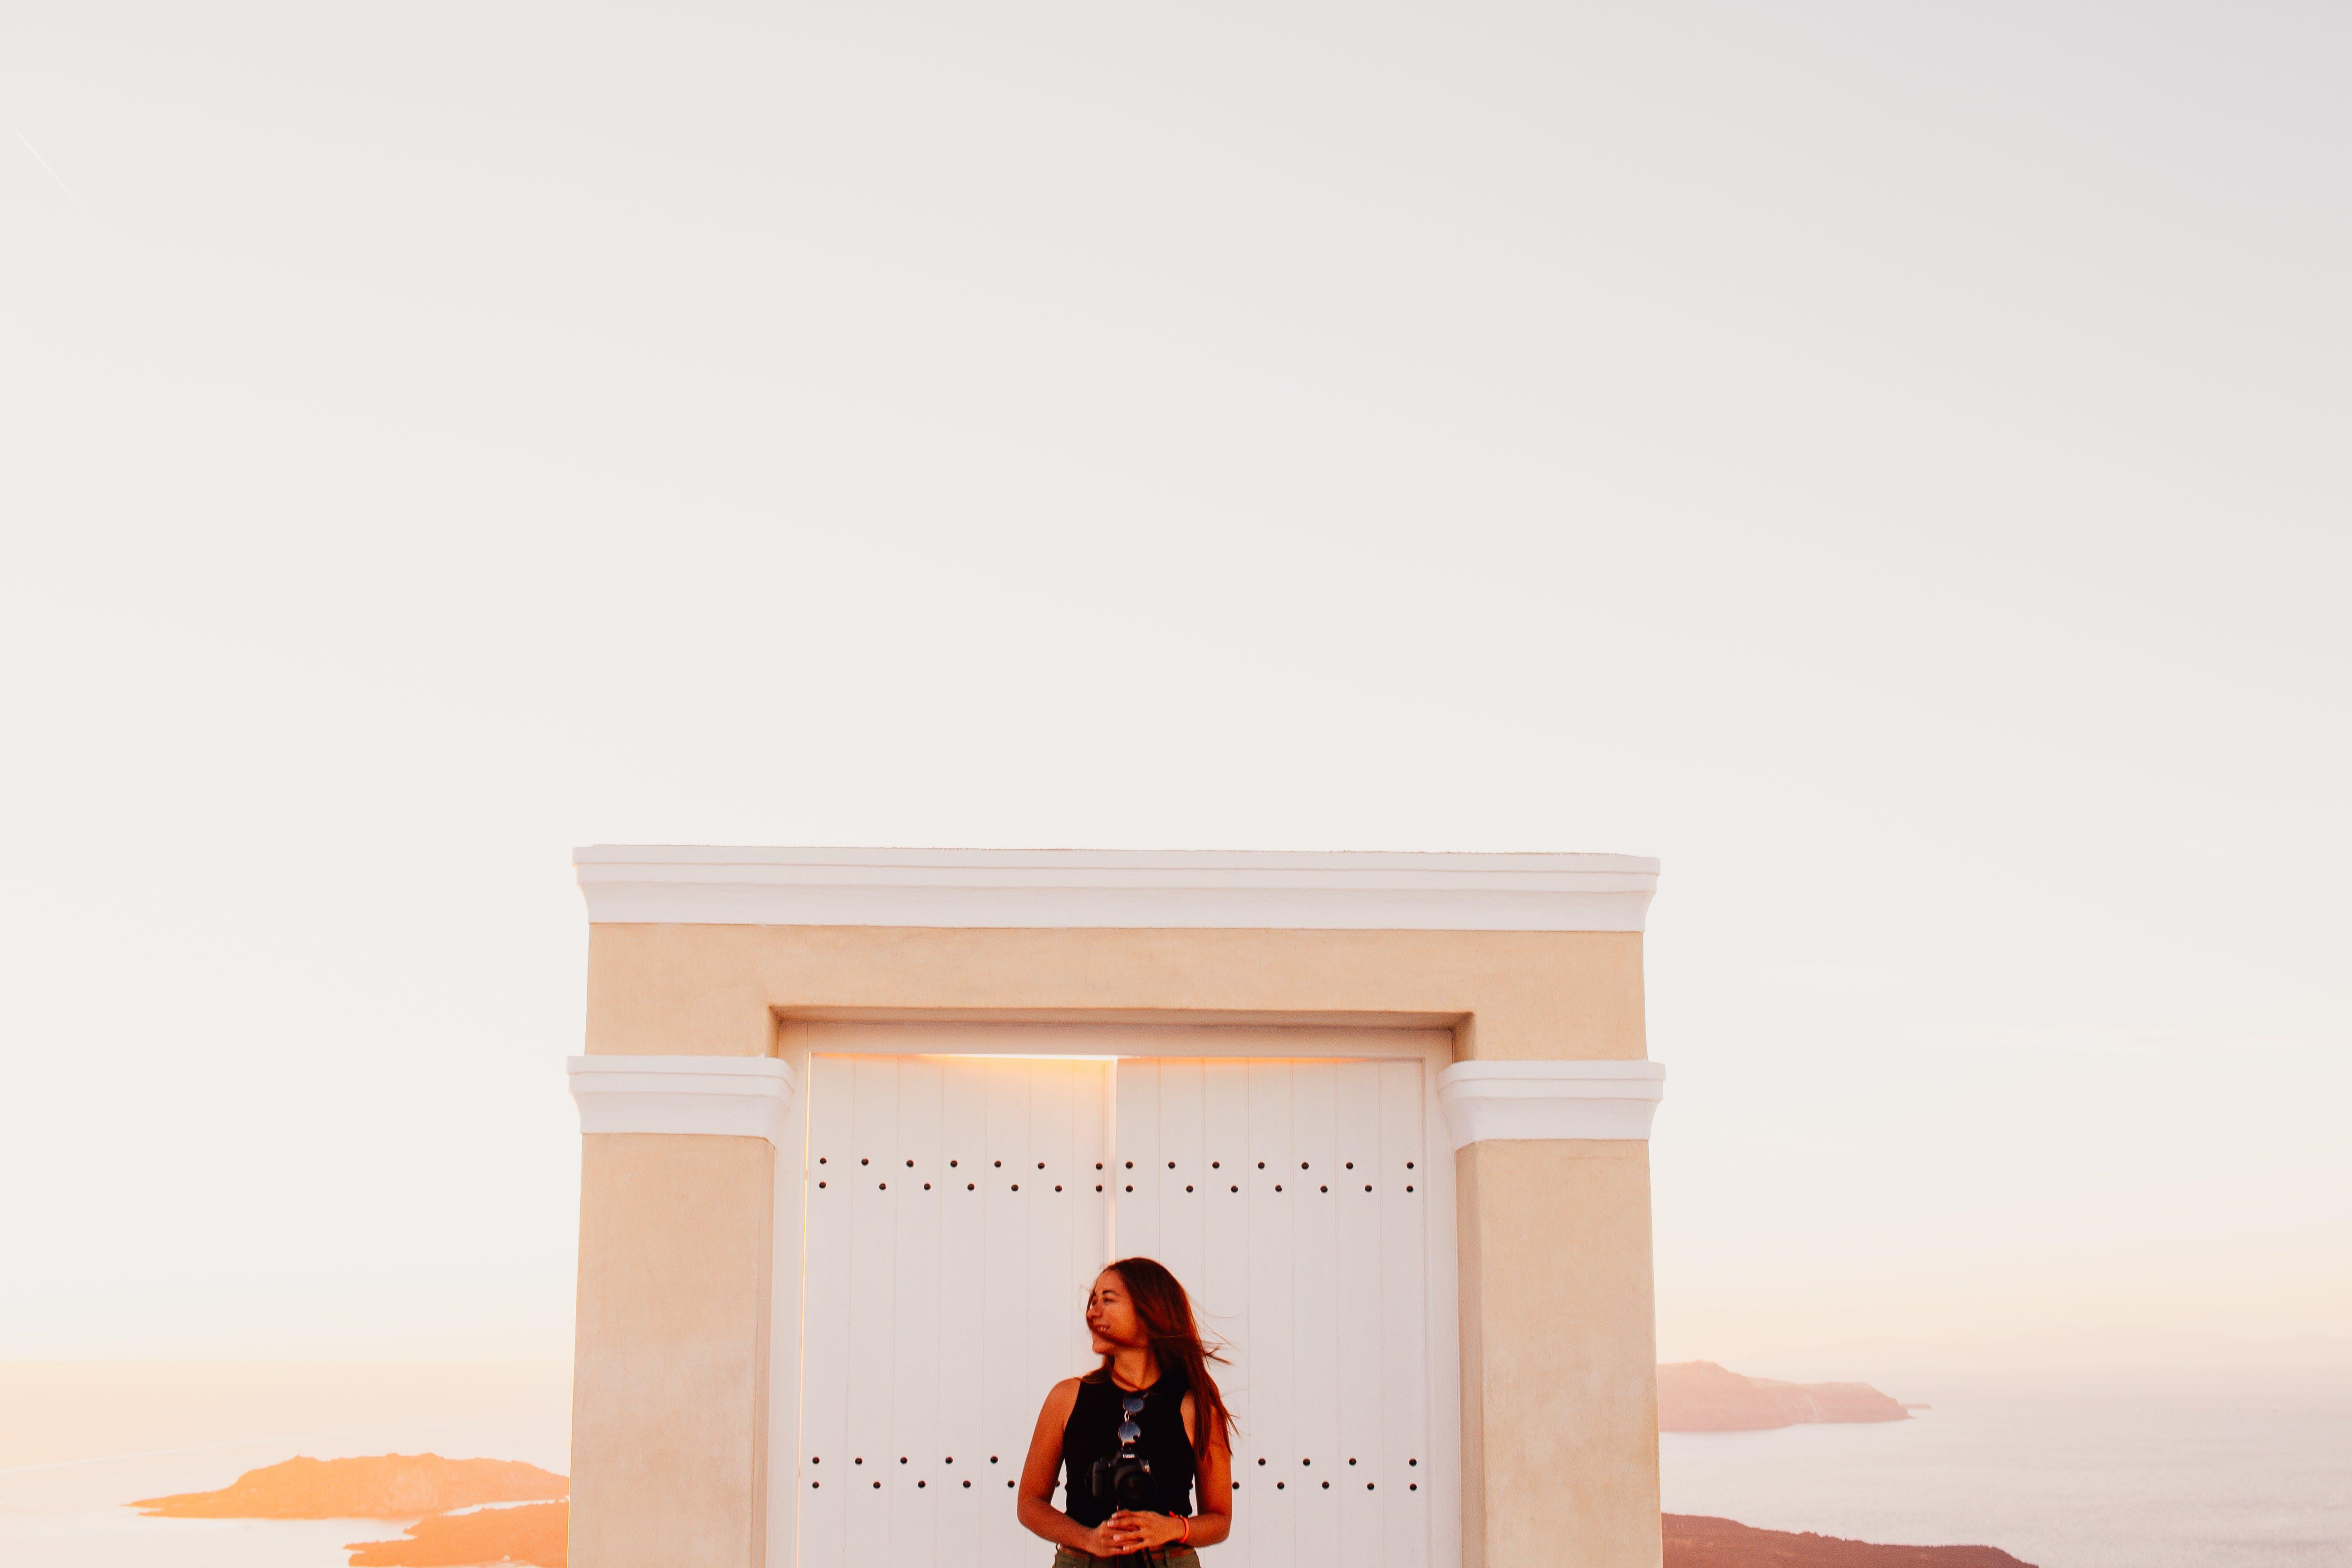 Woman Wearing Black Sleeveless Top Posing in Front of White Wooden Door